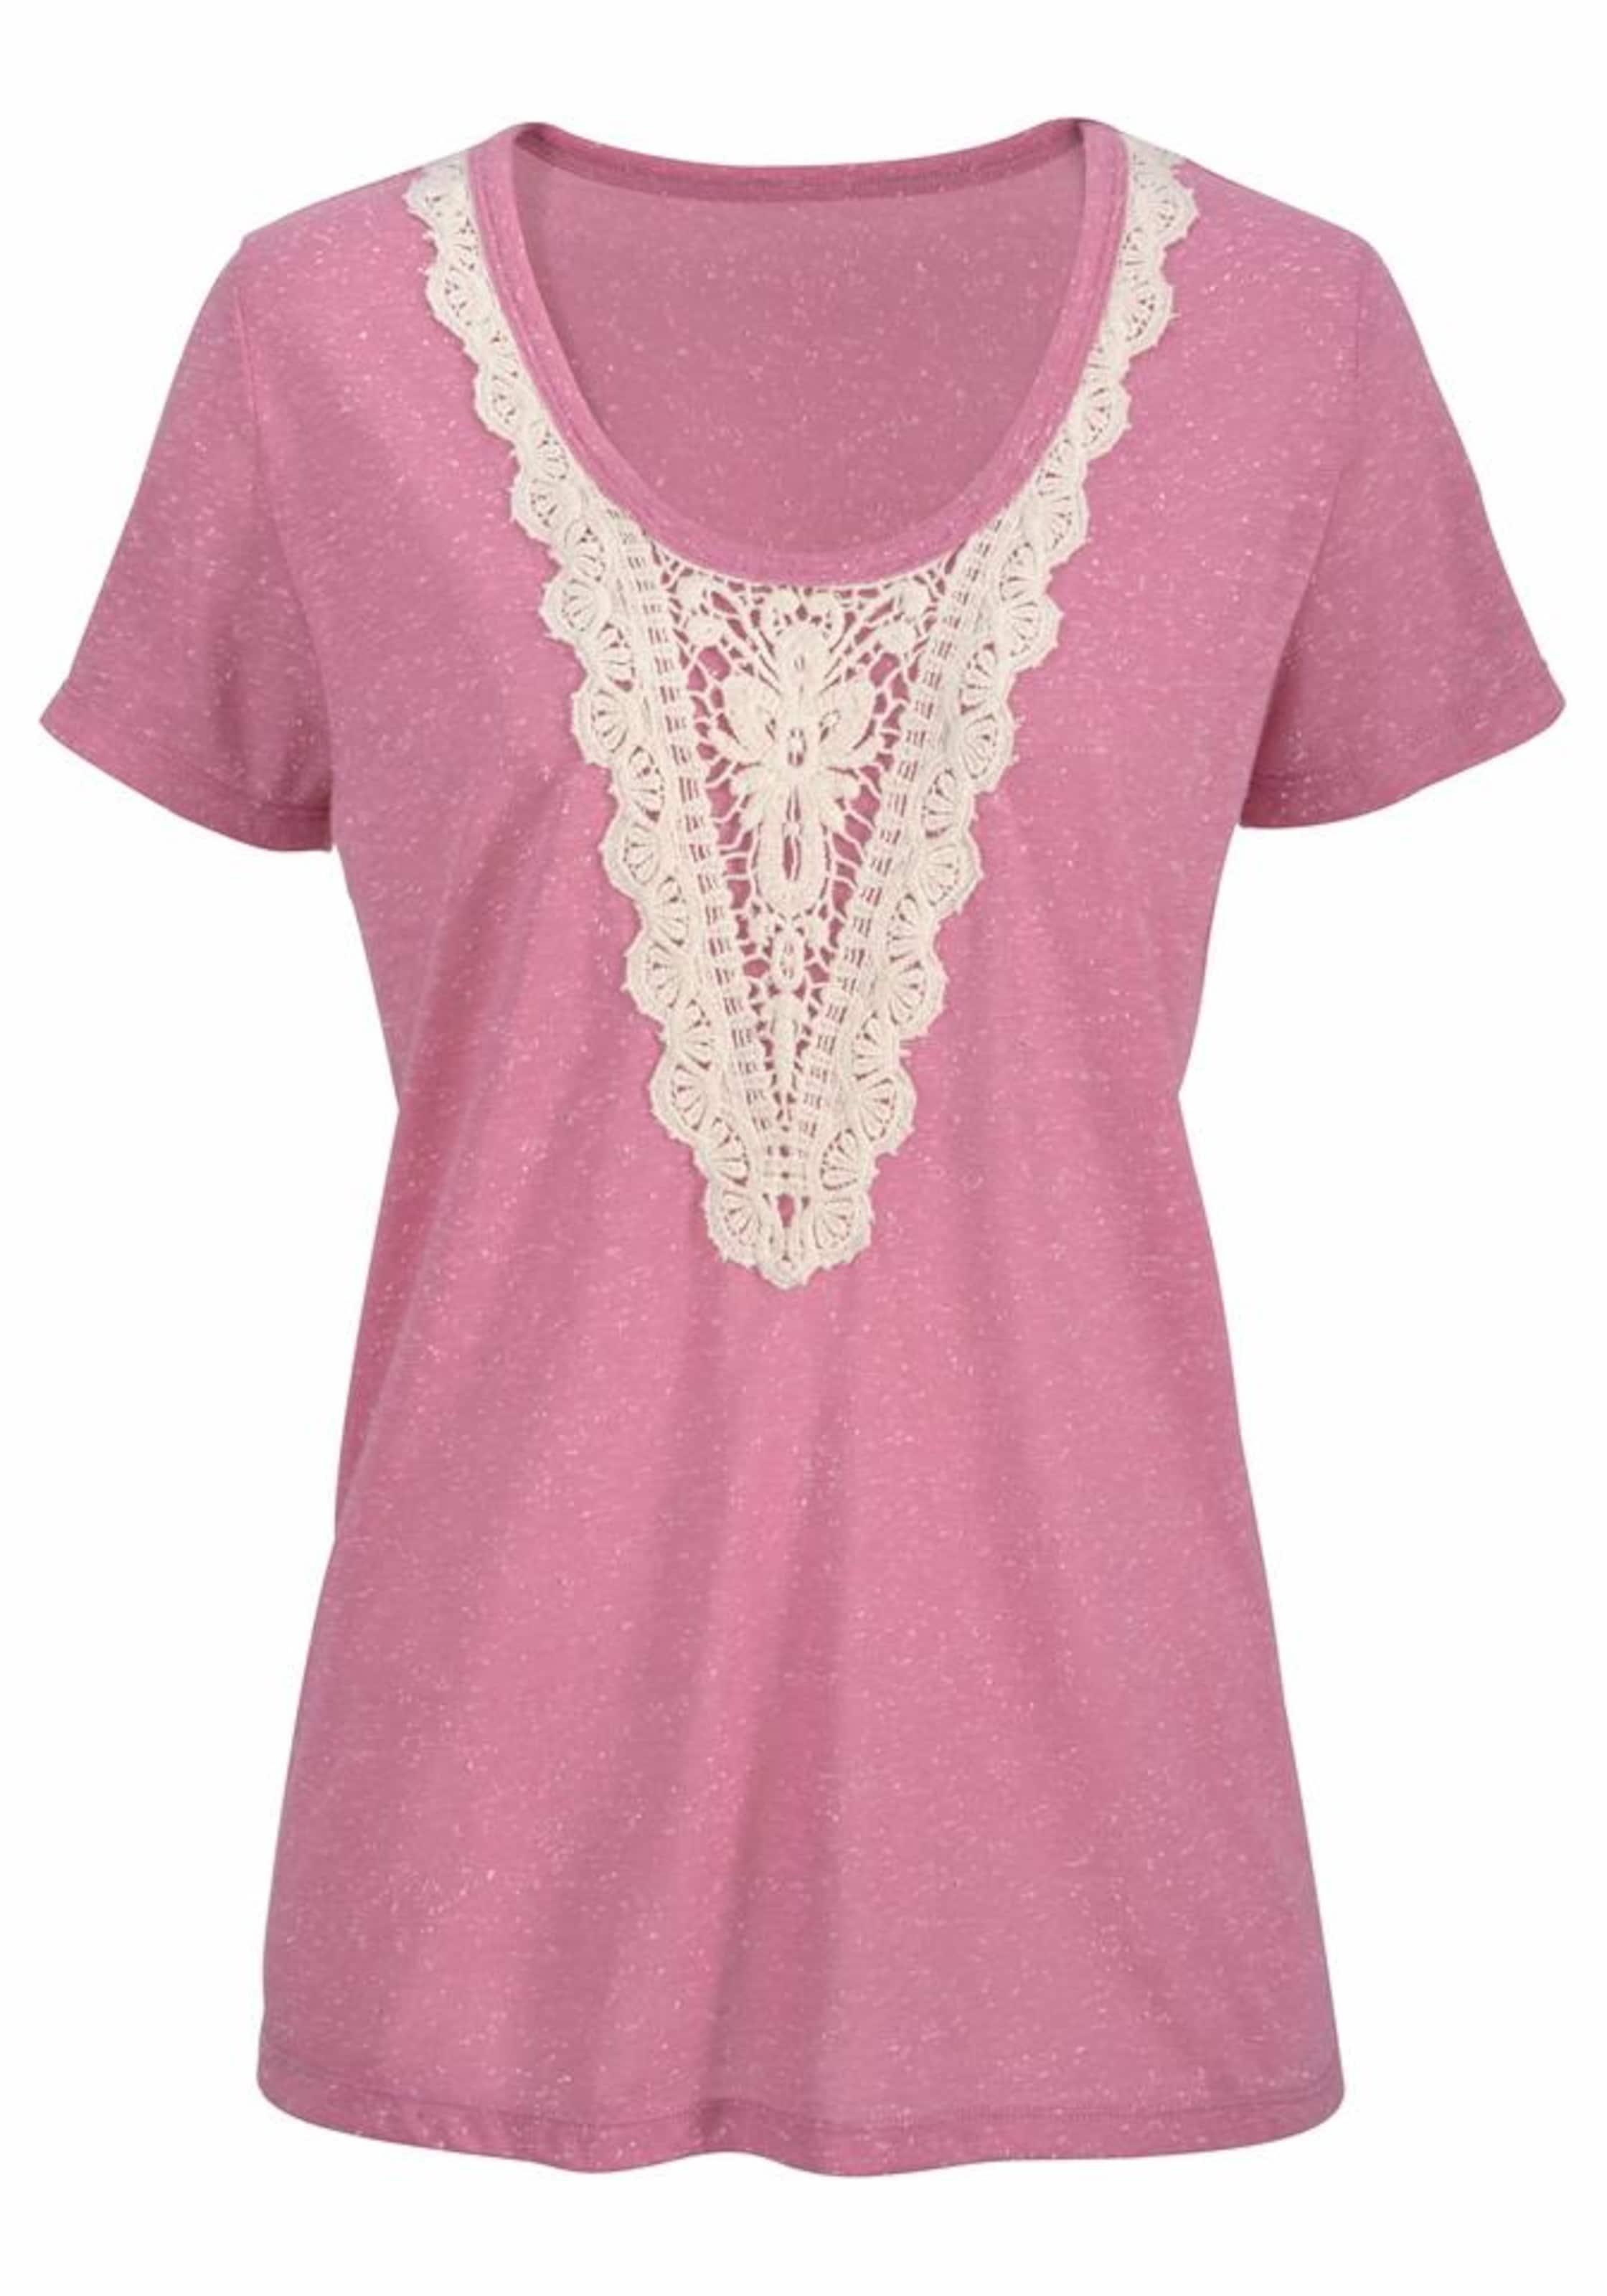 Ltb T En 'oraci' Rose shirt rCBdoWex